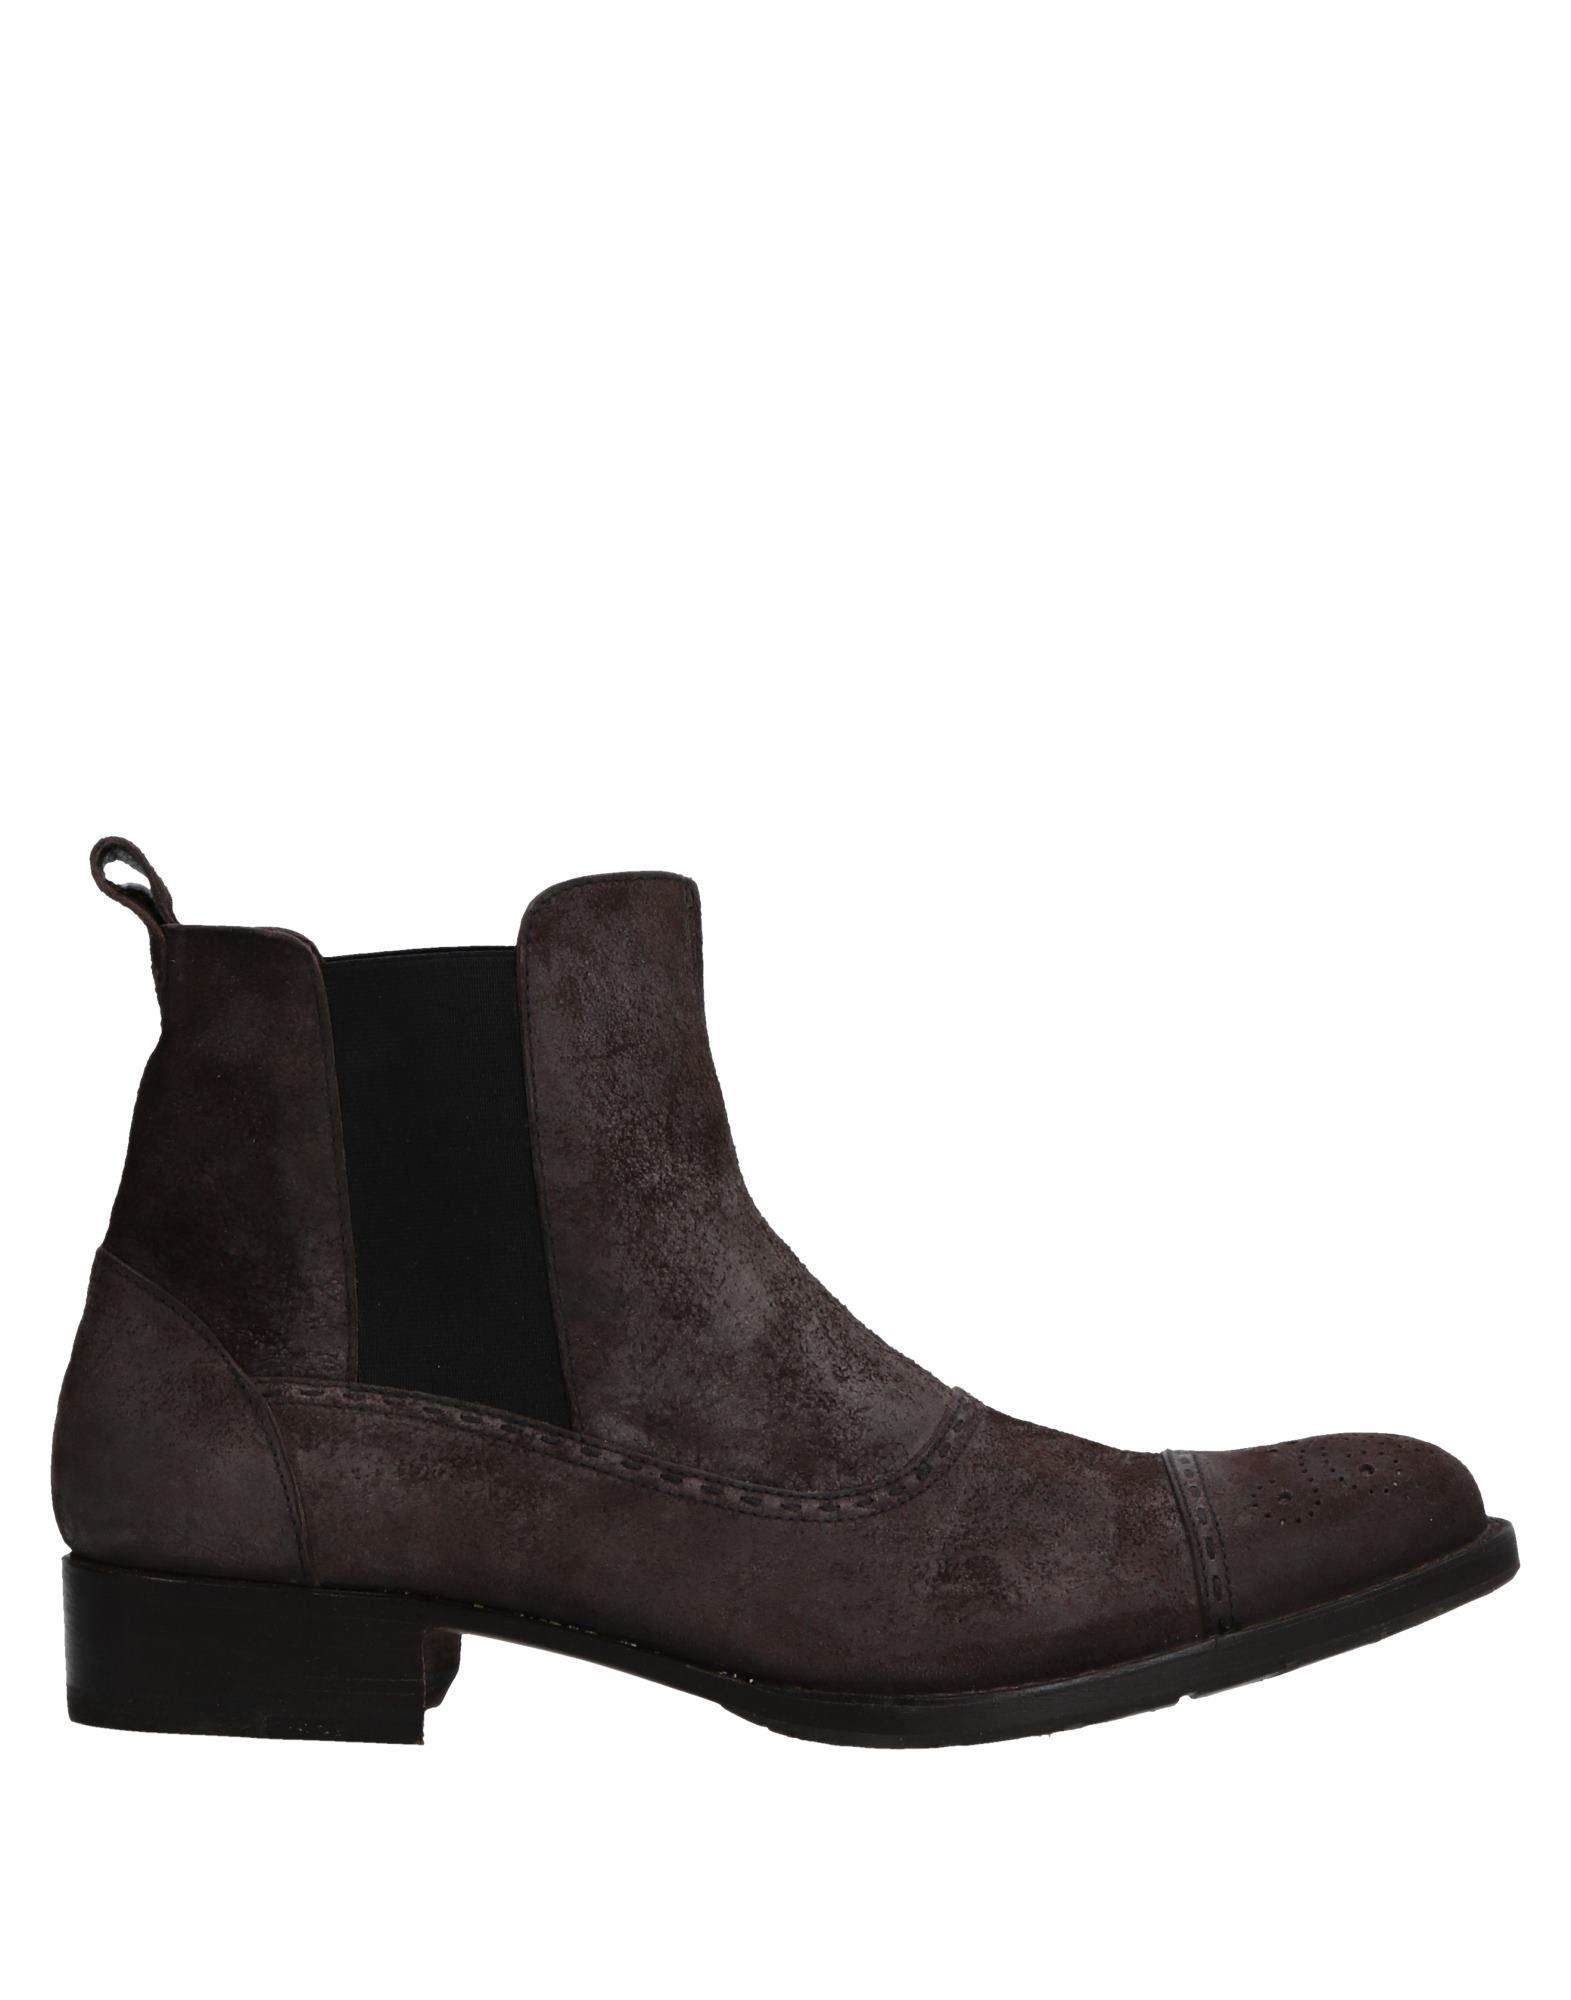 HENRY BEGUELIN Полусапоги и высокие ботинки 404bad40dff8a